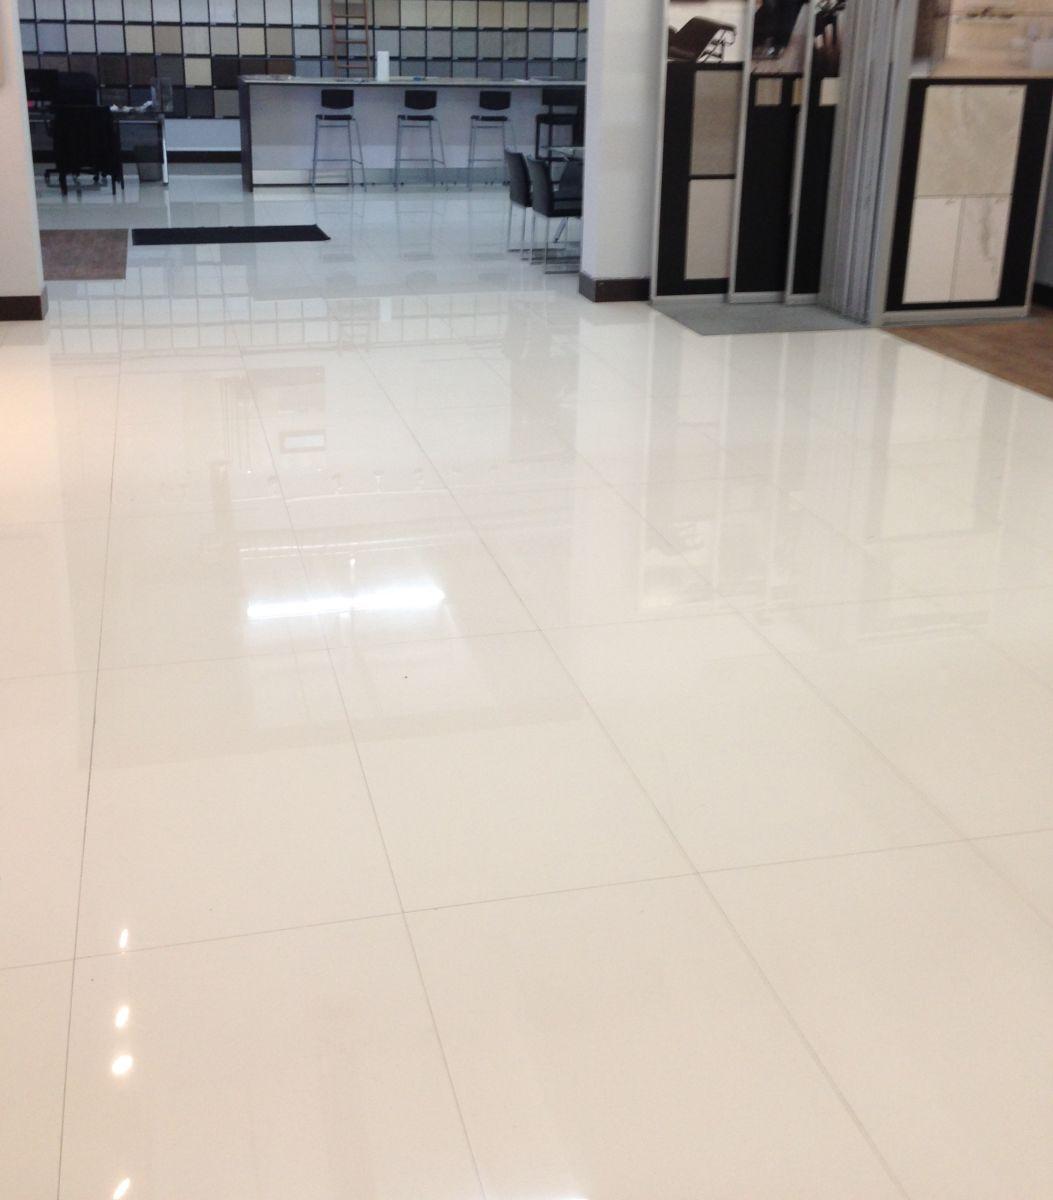 Details about Polished Porcelain Tile Rectified 7x7 Moderni White Double  Loaded Nano Tech